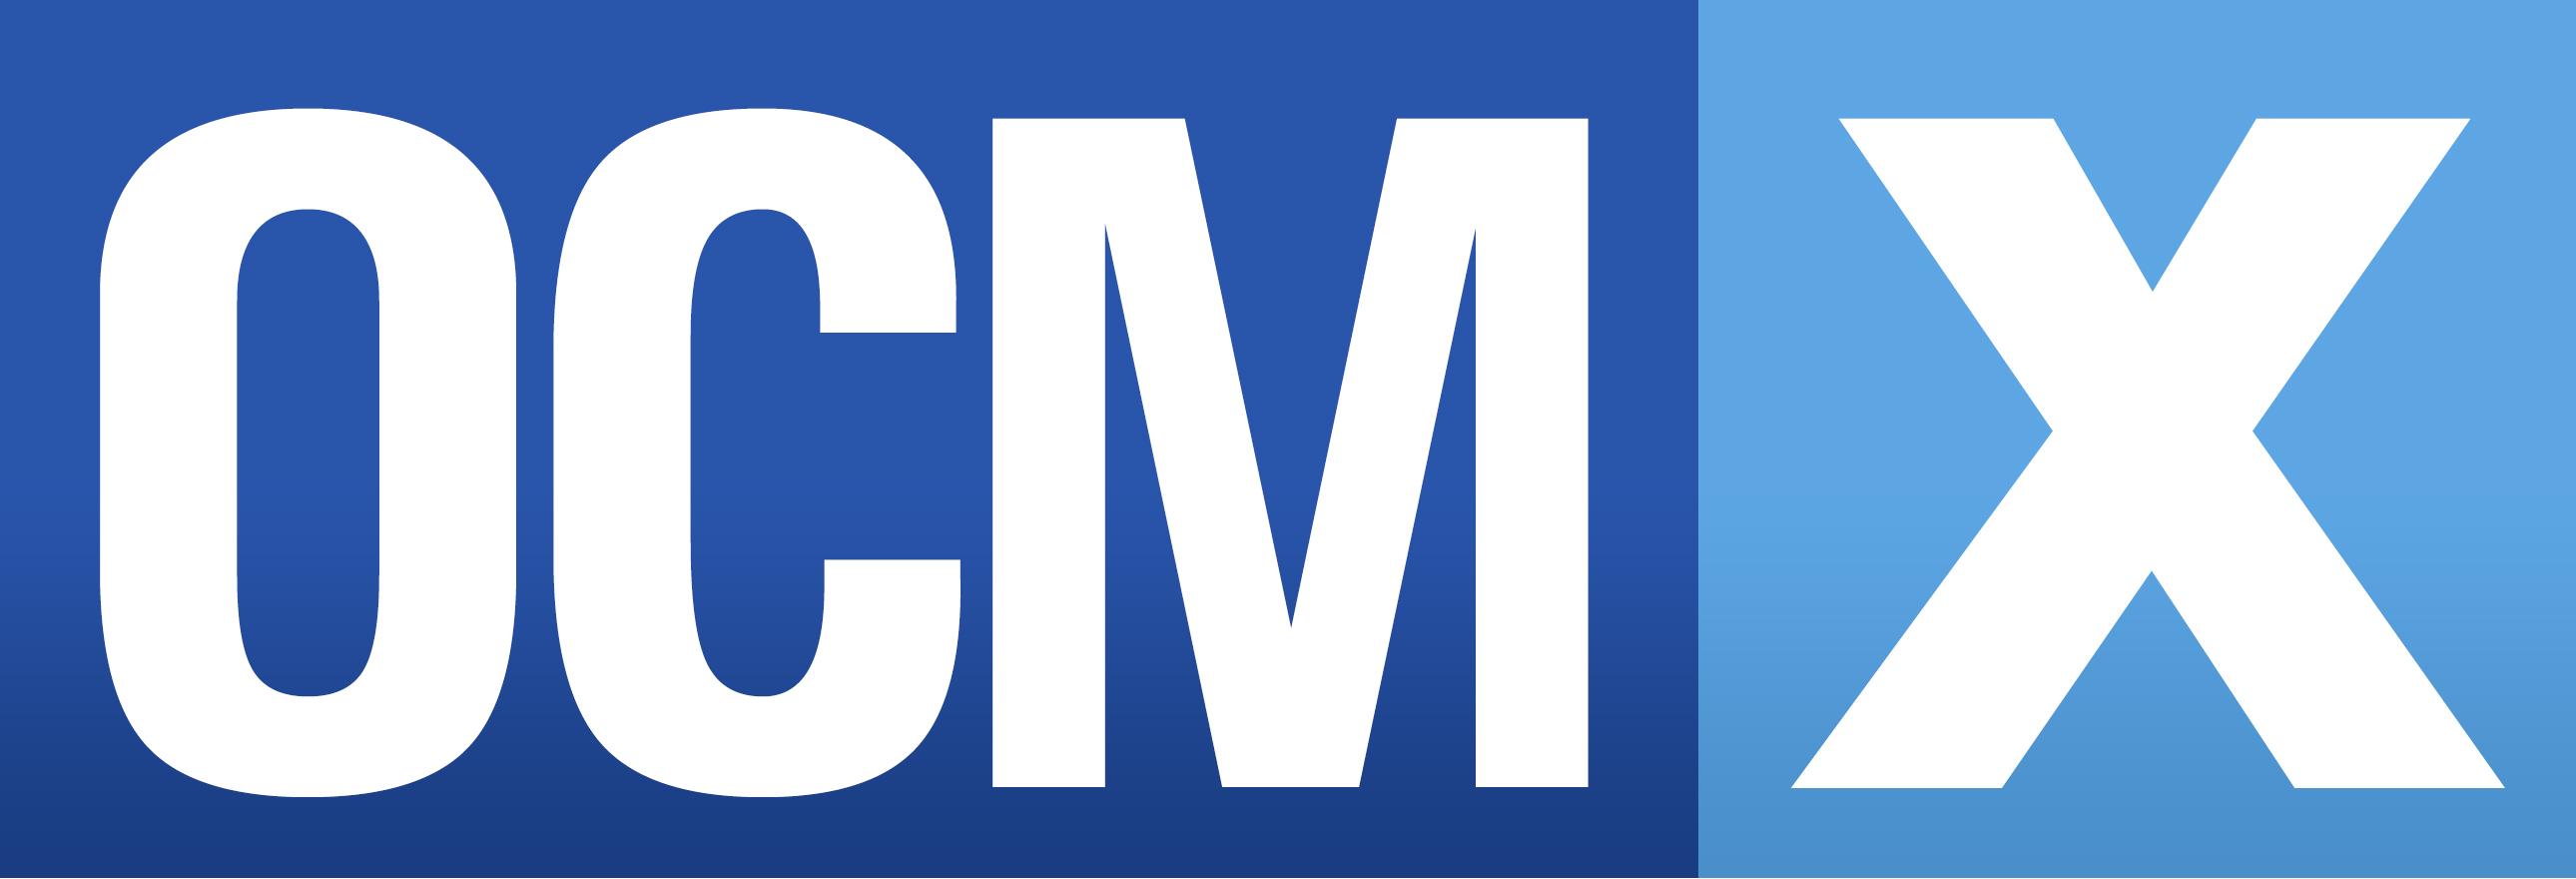 OCMX Logo JPEG - Vancouver Event (Sep 29):  VanFUNDING 2015 Crowdfunding Conference